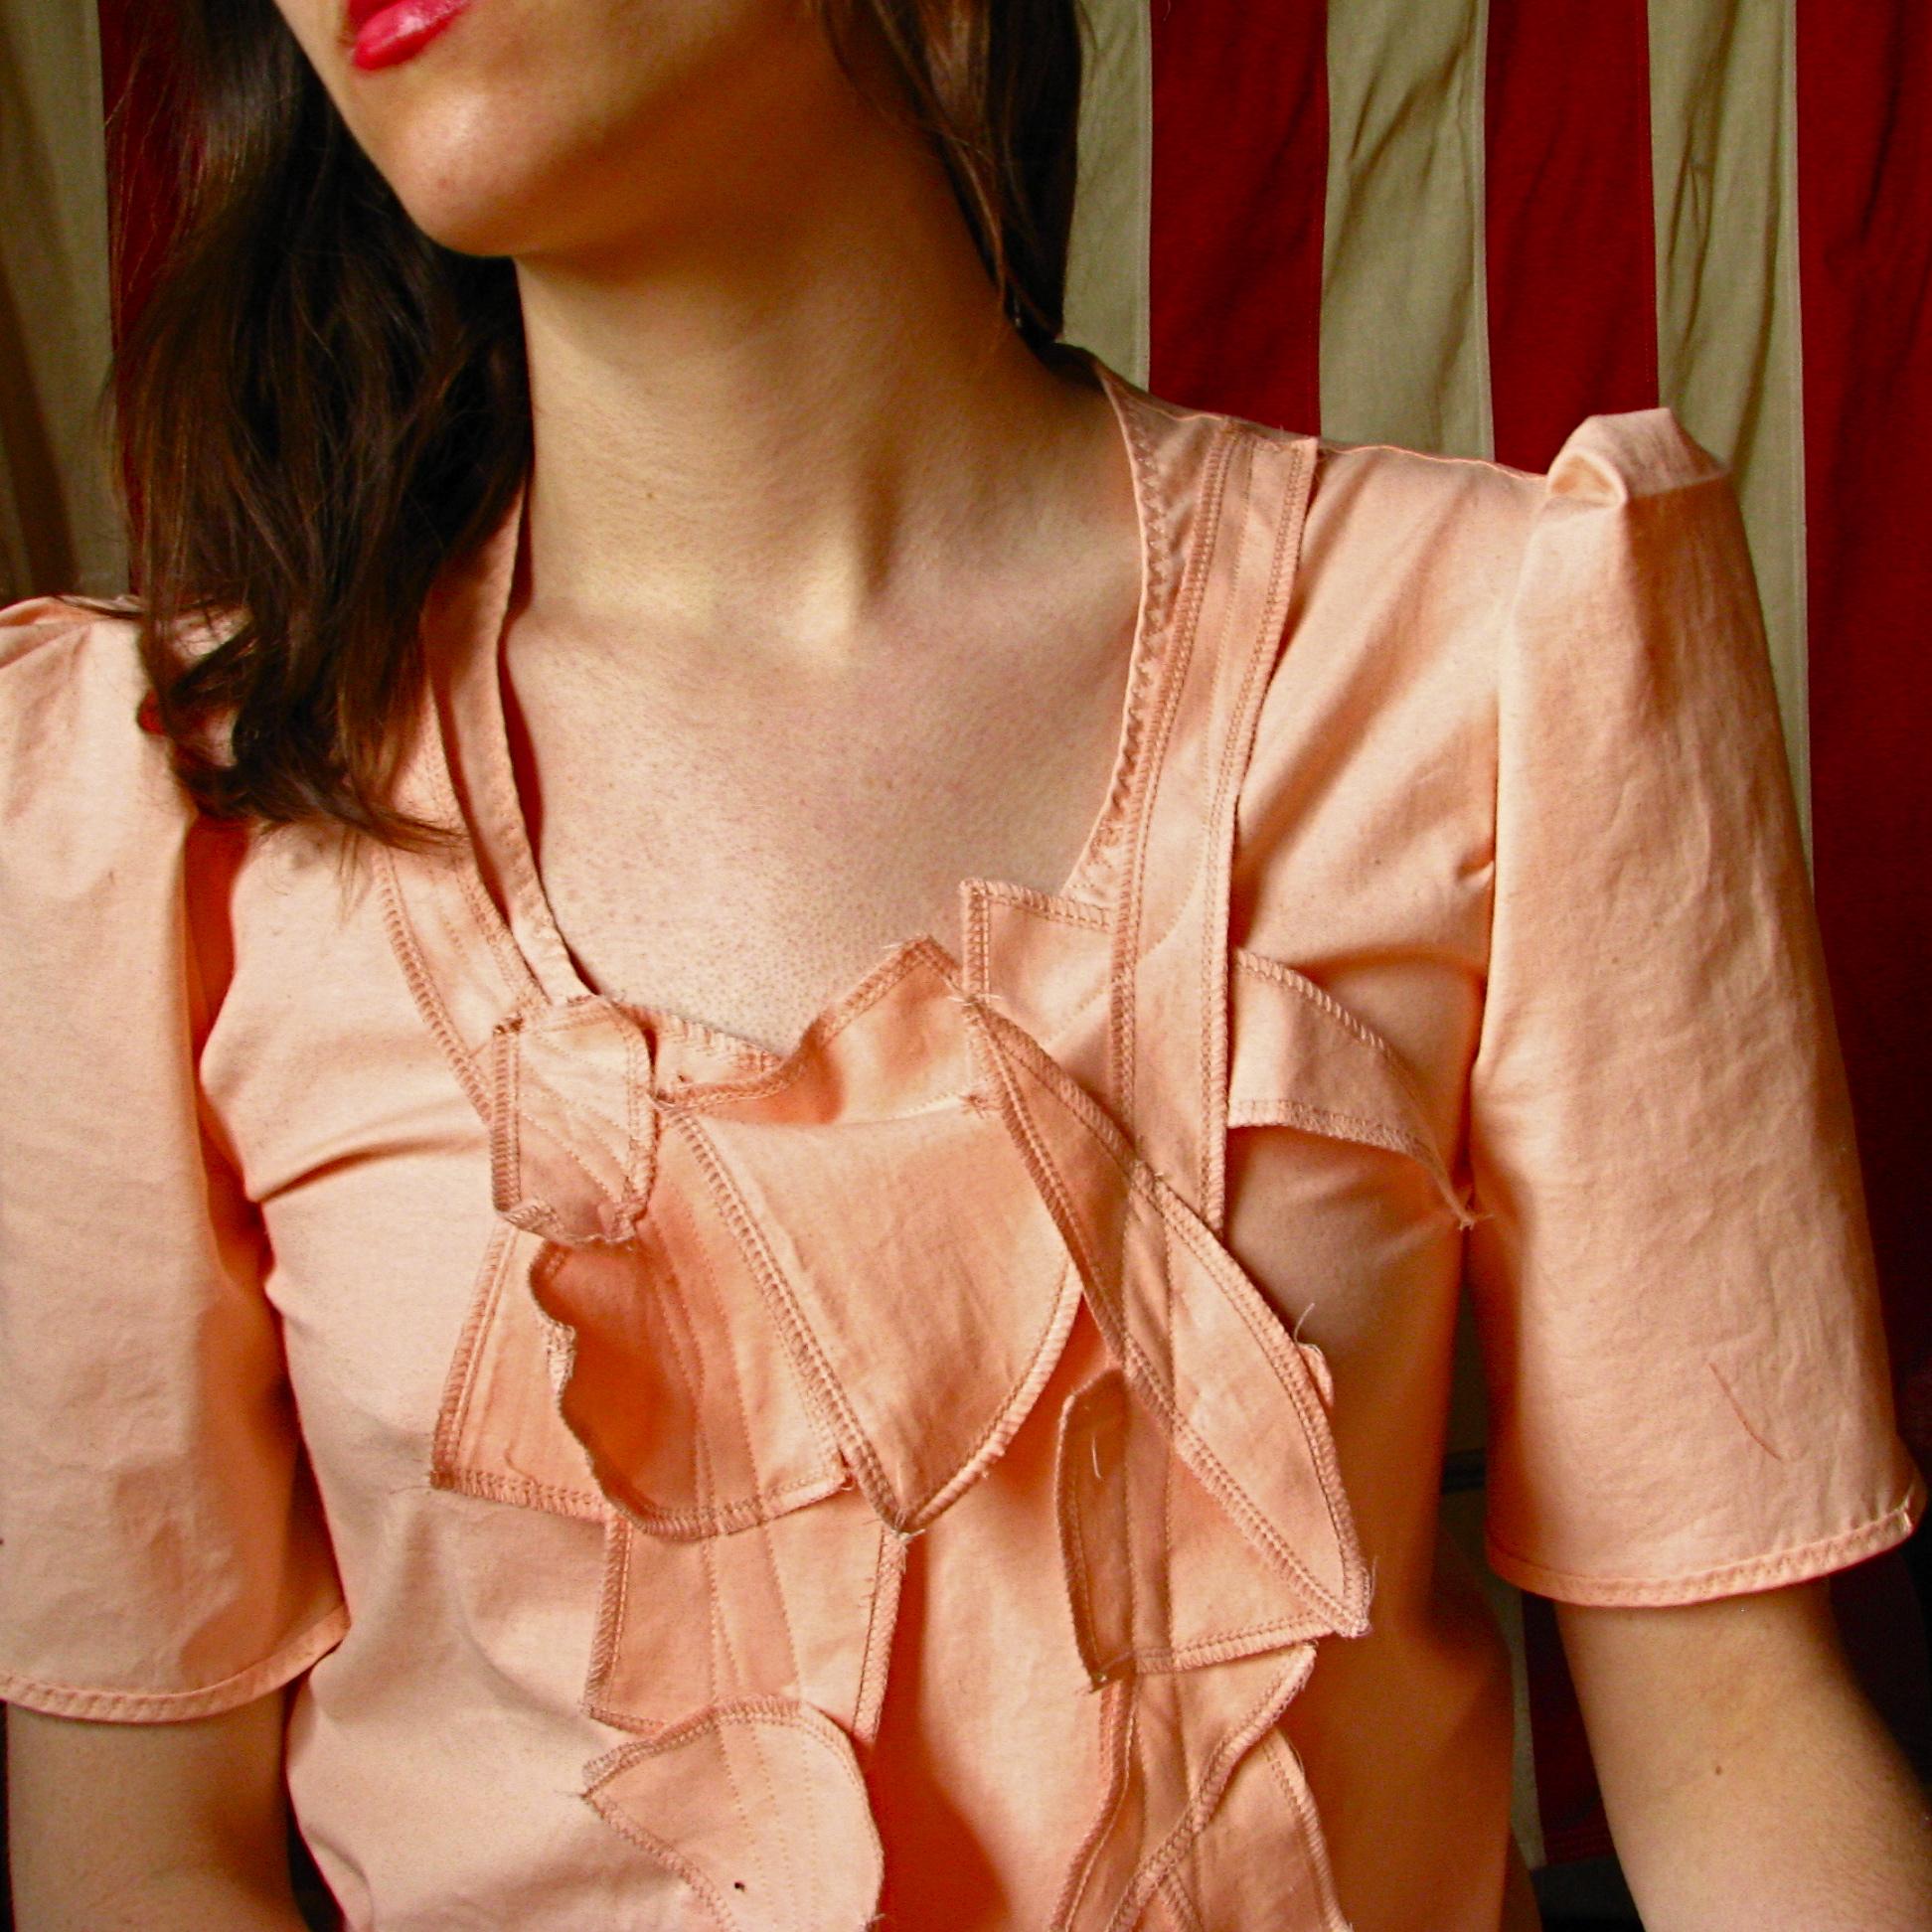 staralfur-blouse_2445885995_o.jpg